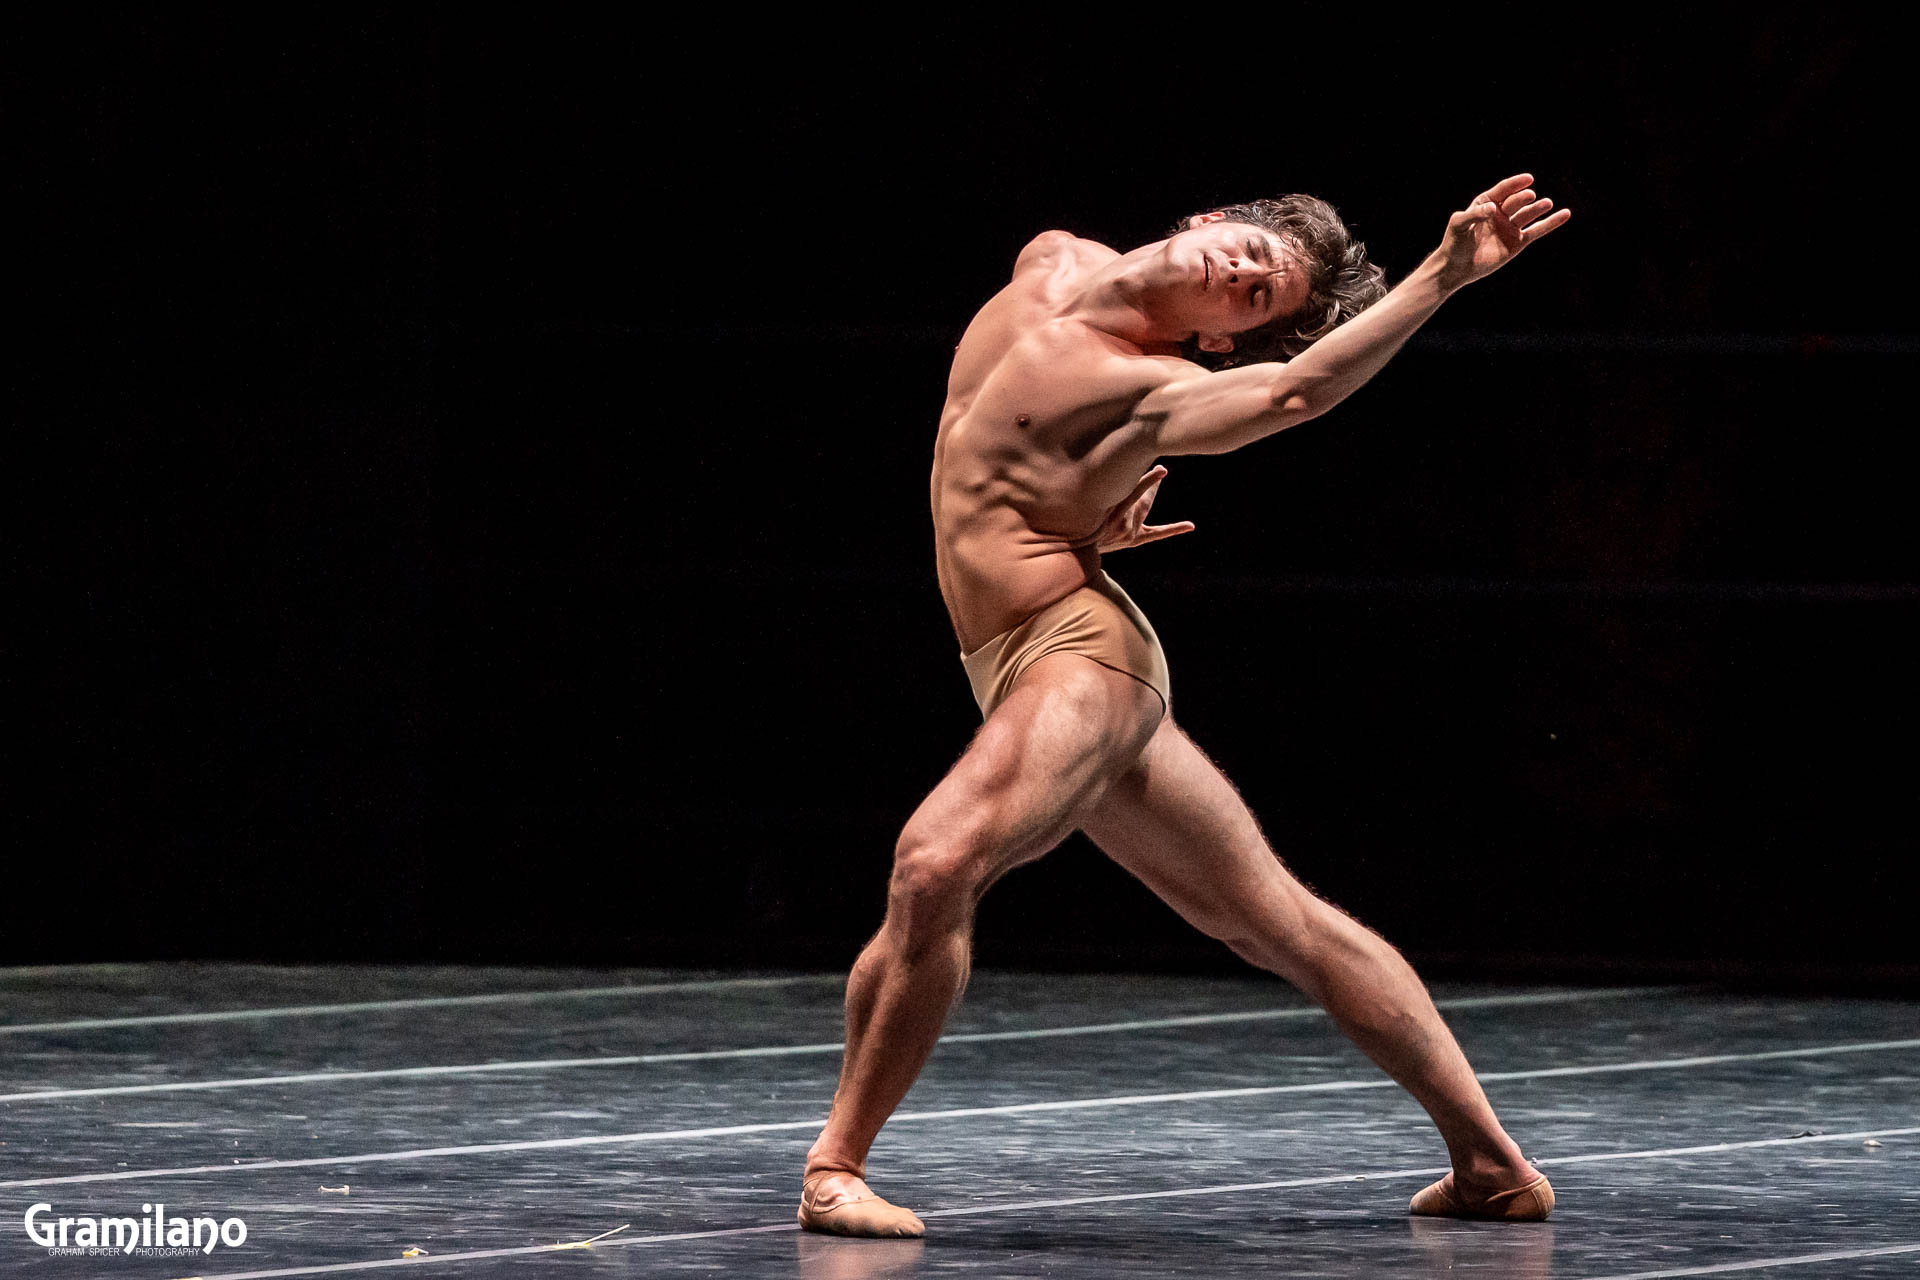 Sergio Bernal in Ricardo Cue's The Swan